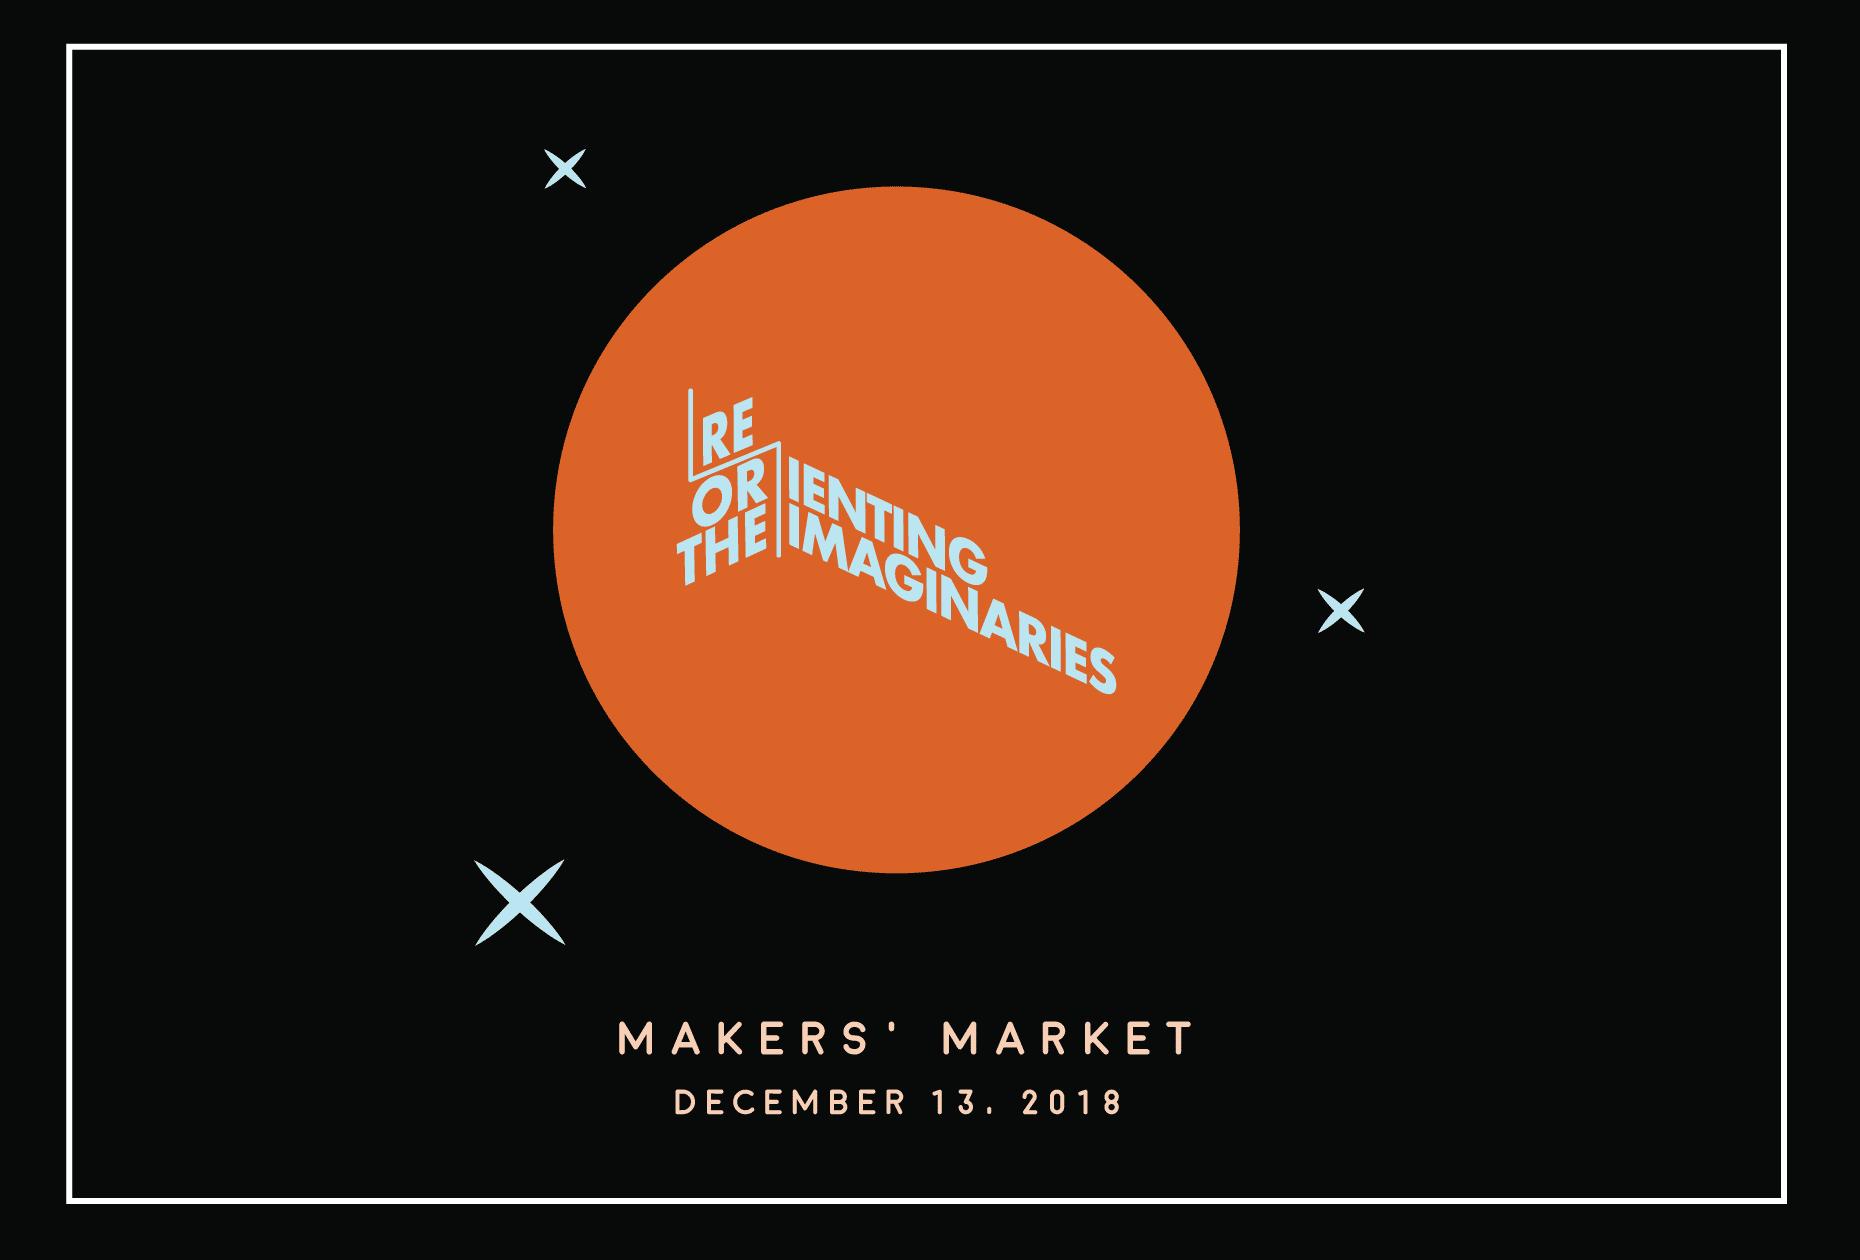 Reorienting the Imaginaries: Makers' Market